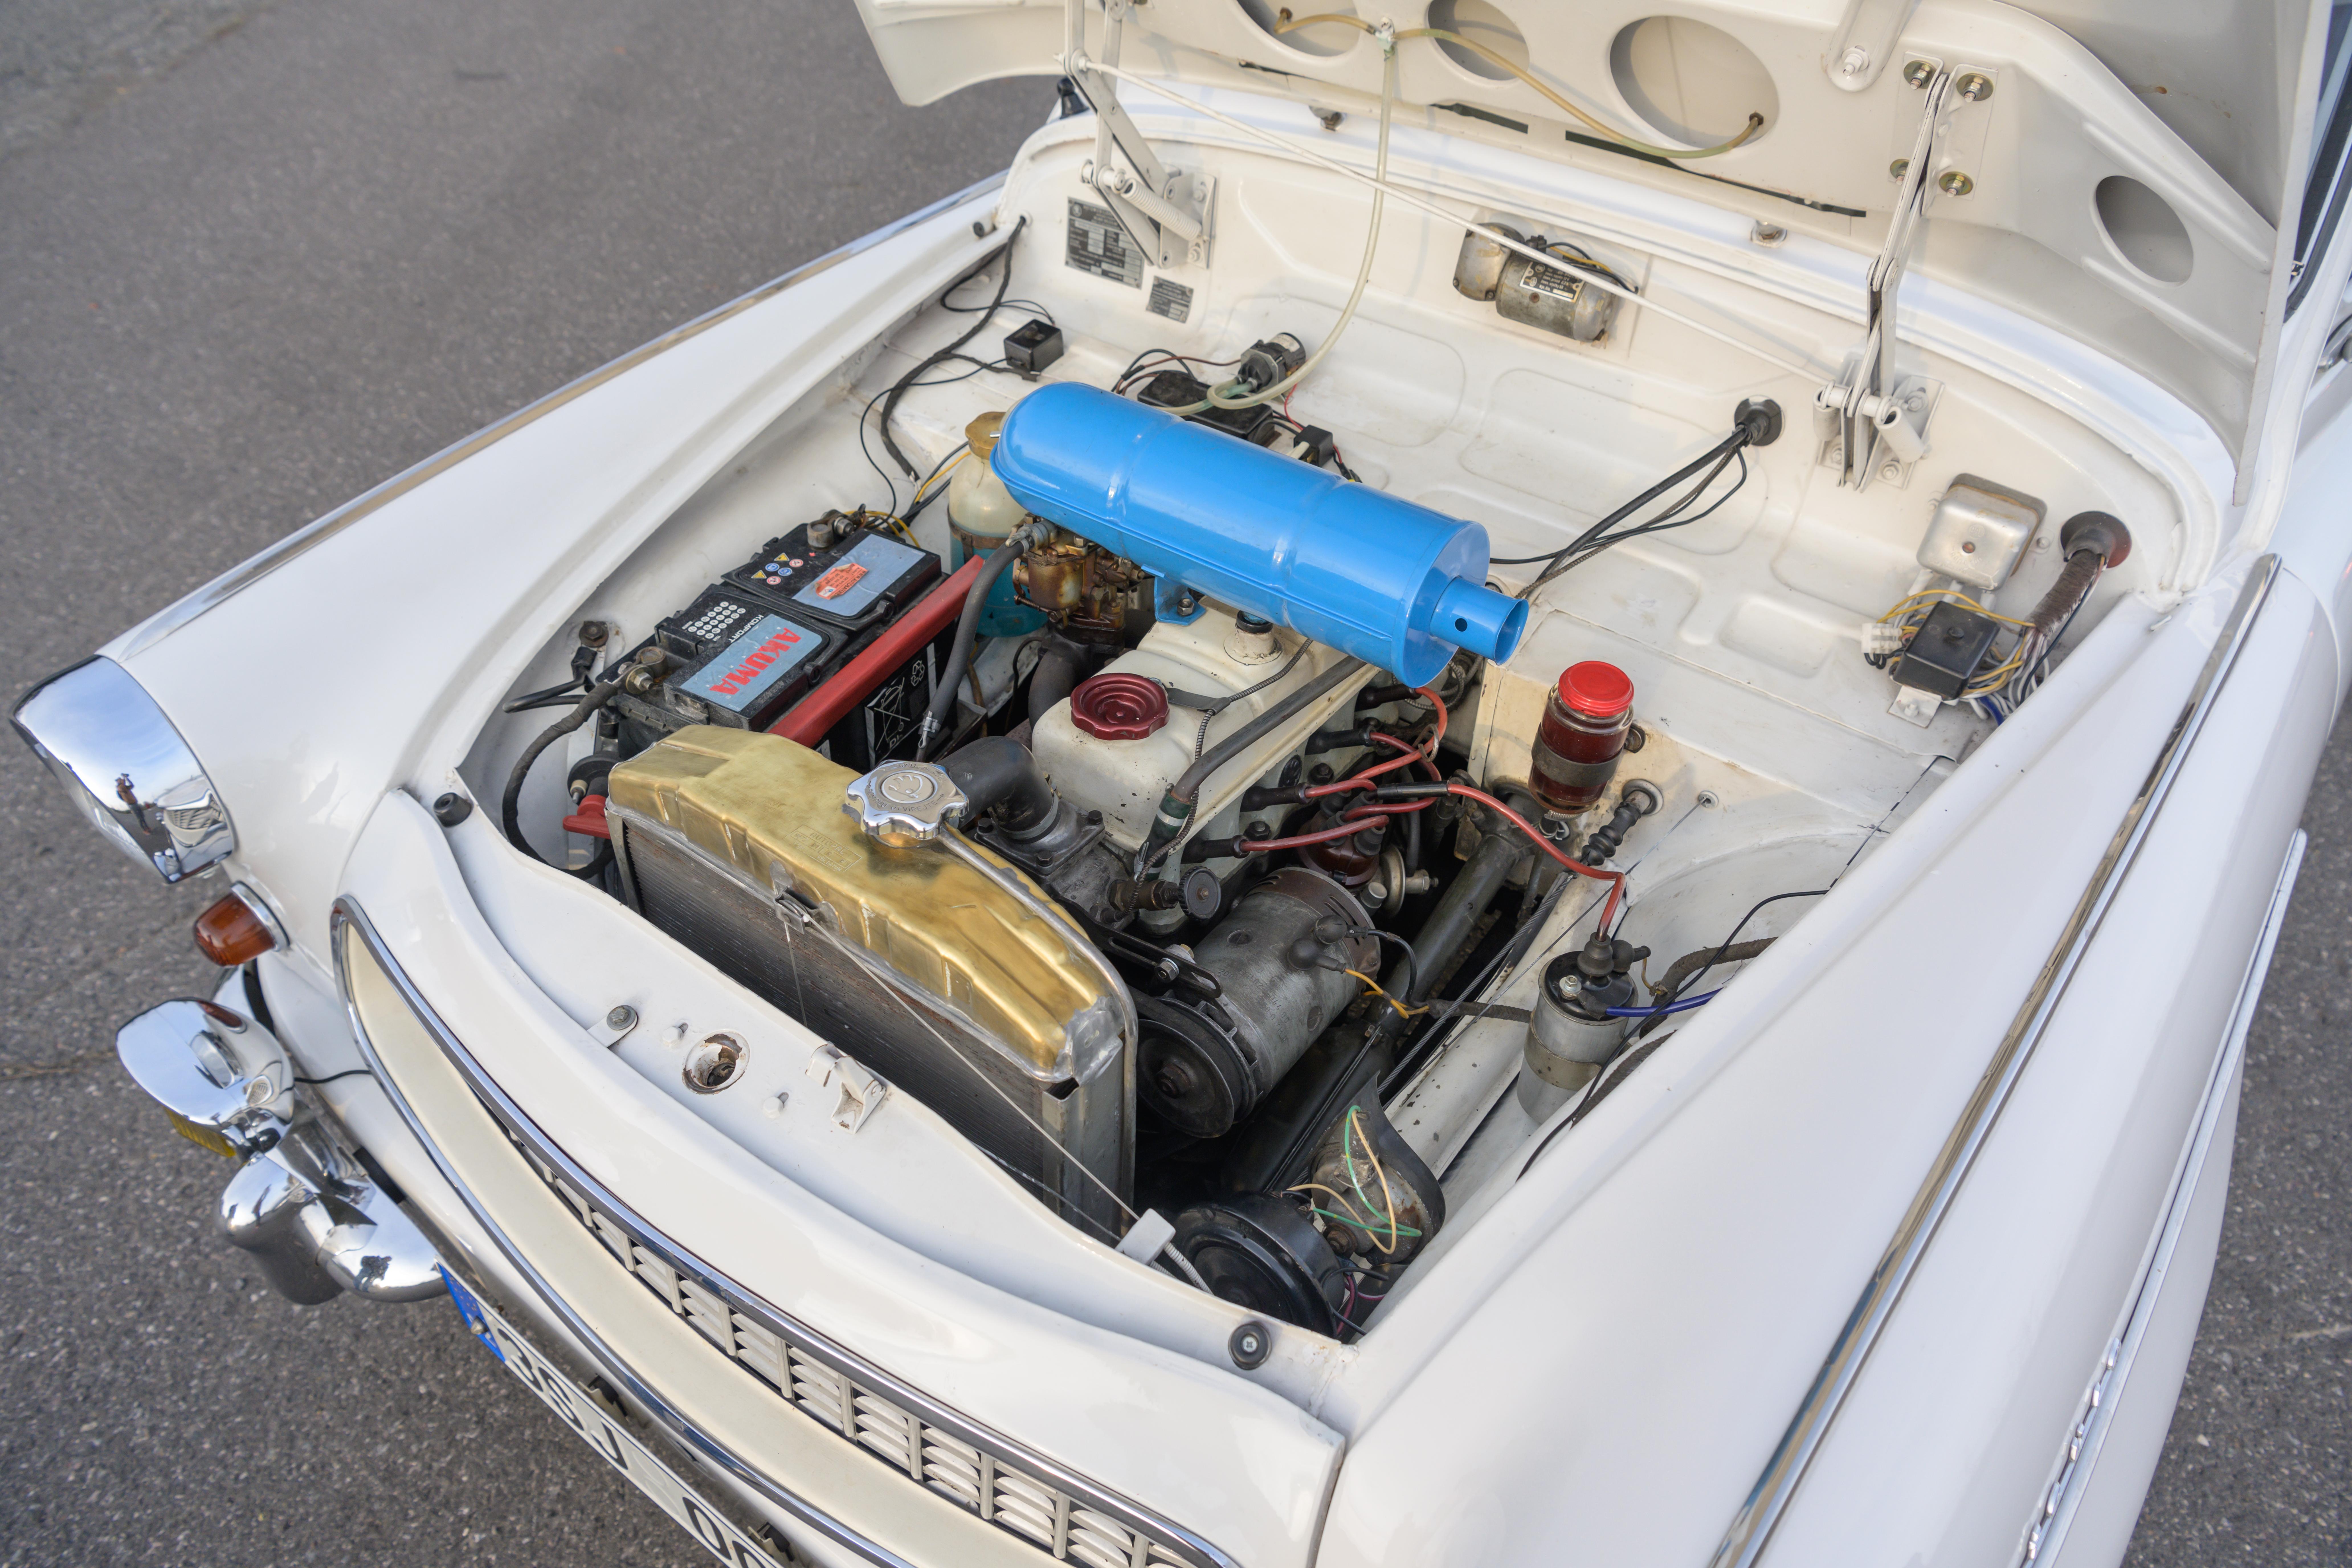 octavia-skoda-history-engine-car-melichar